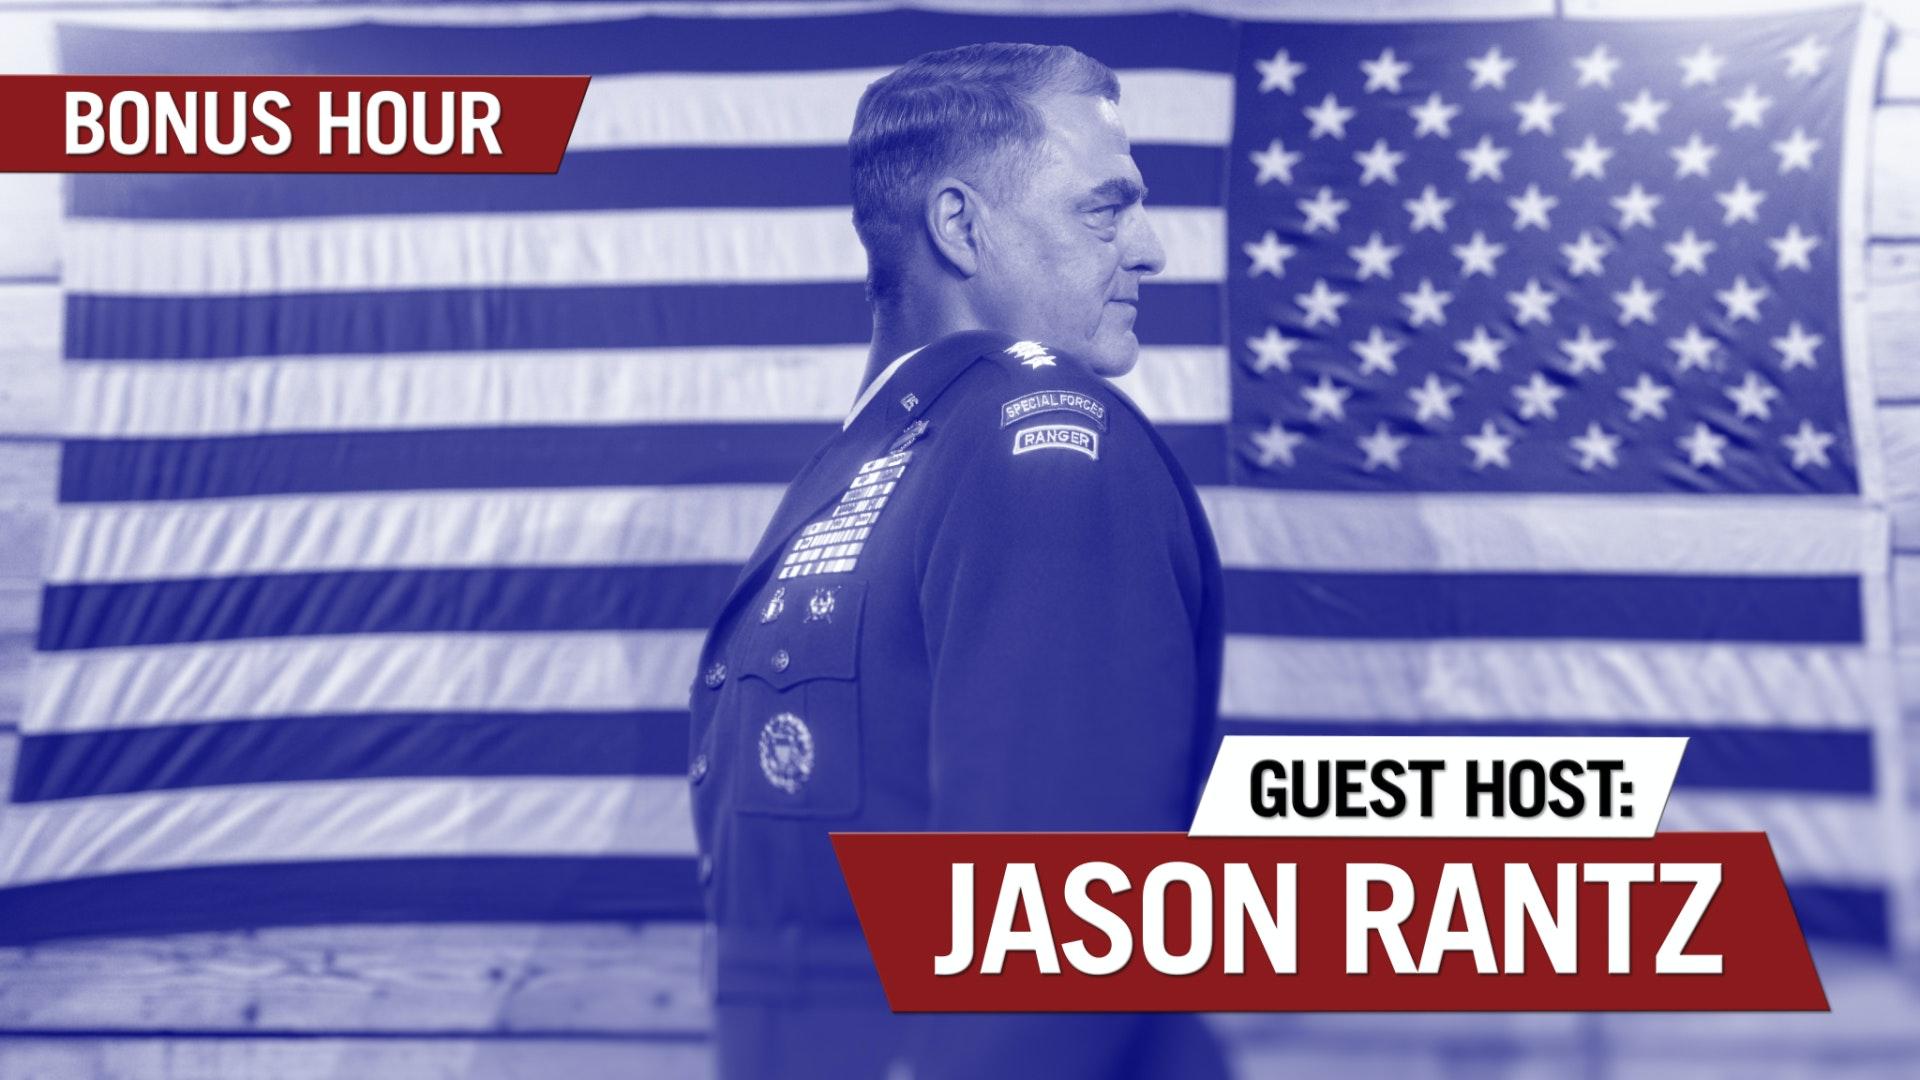 Everything Is Backward [Bonus Hours 1 & 2 Guest Hosted By Jason Rantz]